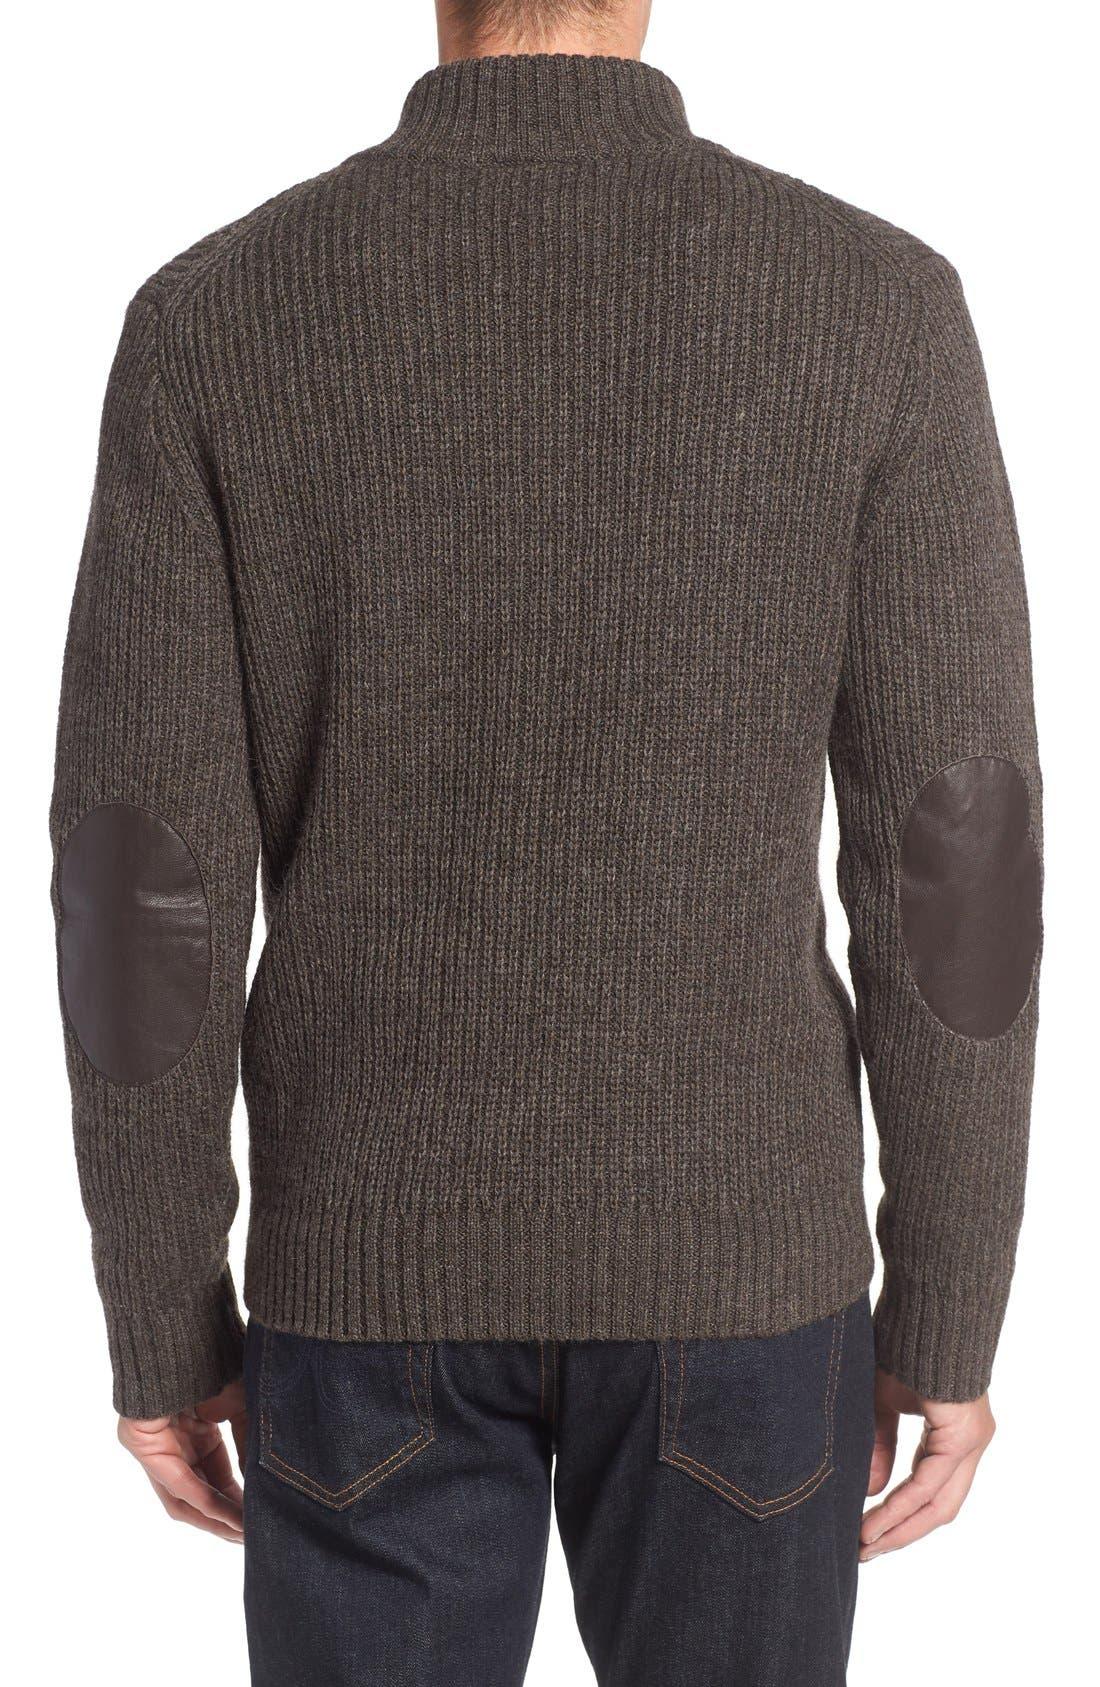 'Huka Lodge' Merino Wool Blend Quarter Zip Sweater,                             Alternate thumbnail 2, color,                             Dirt